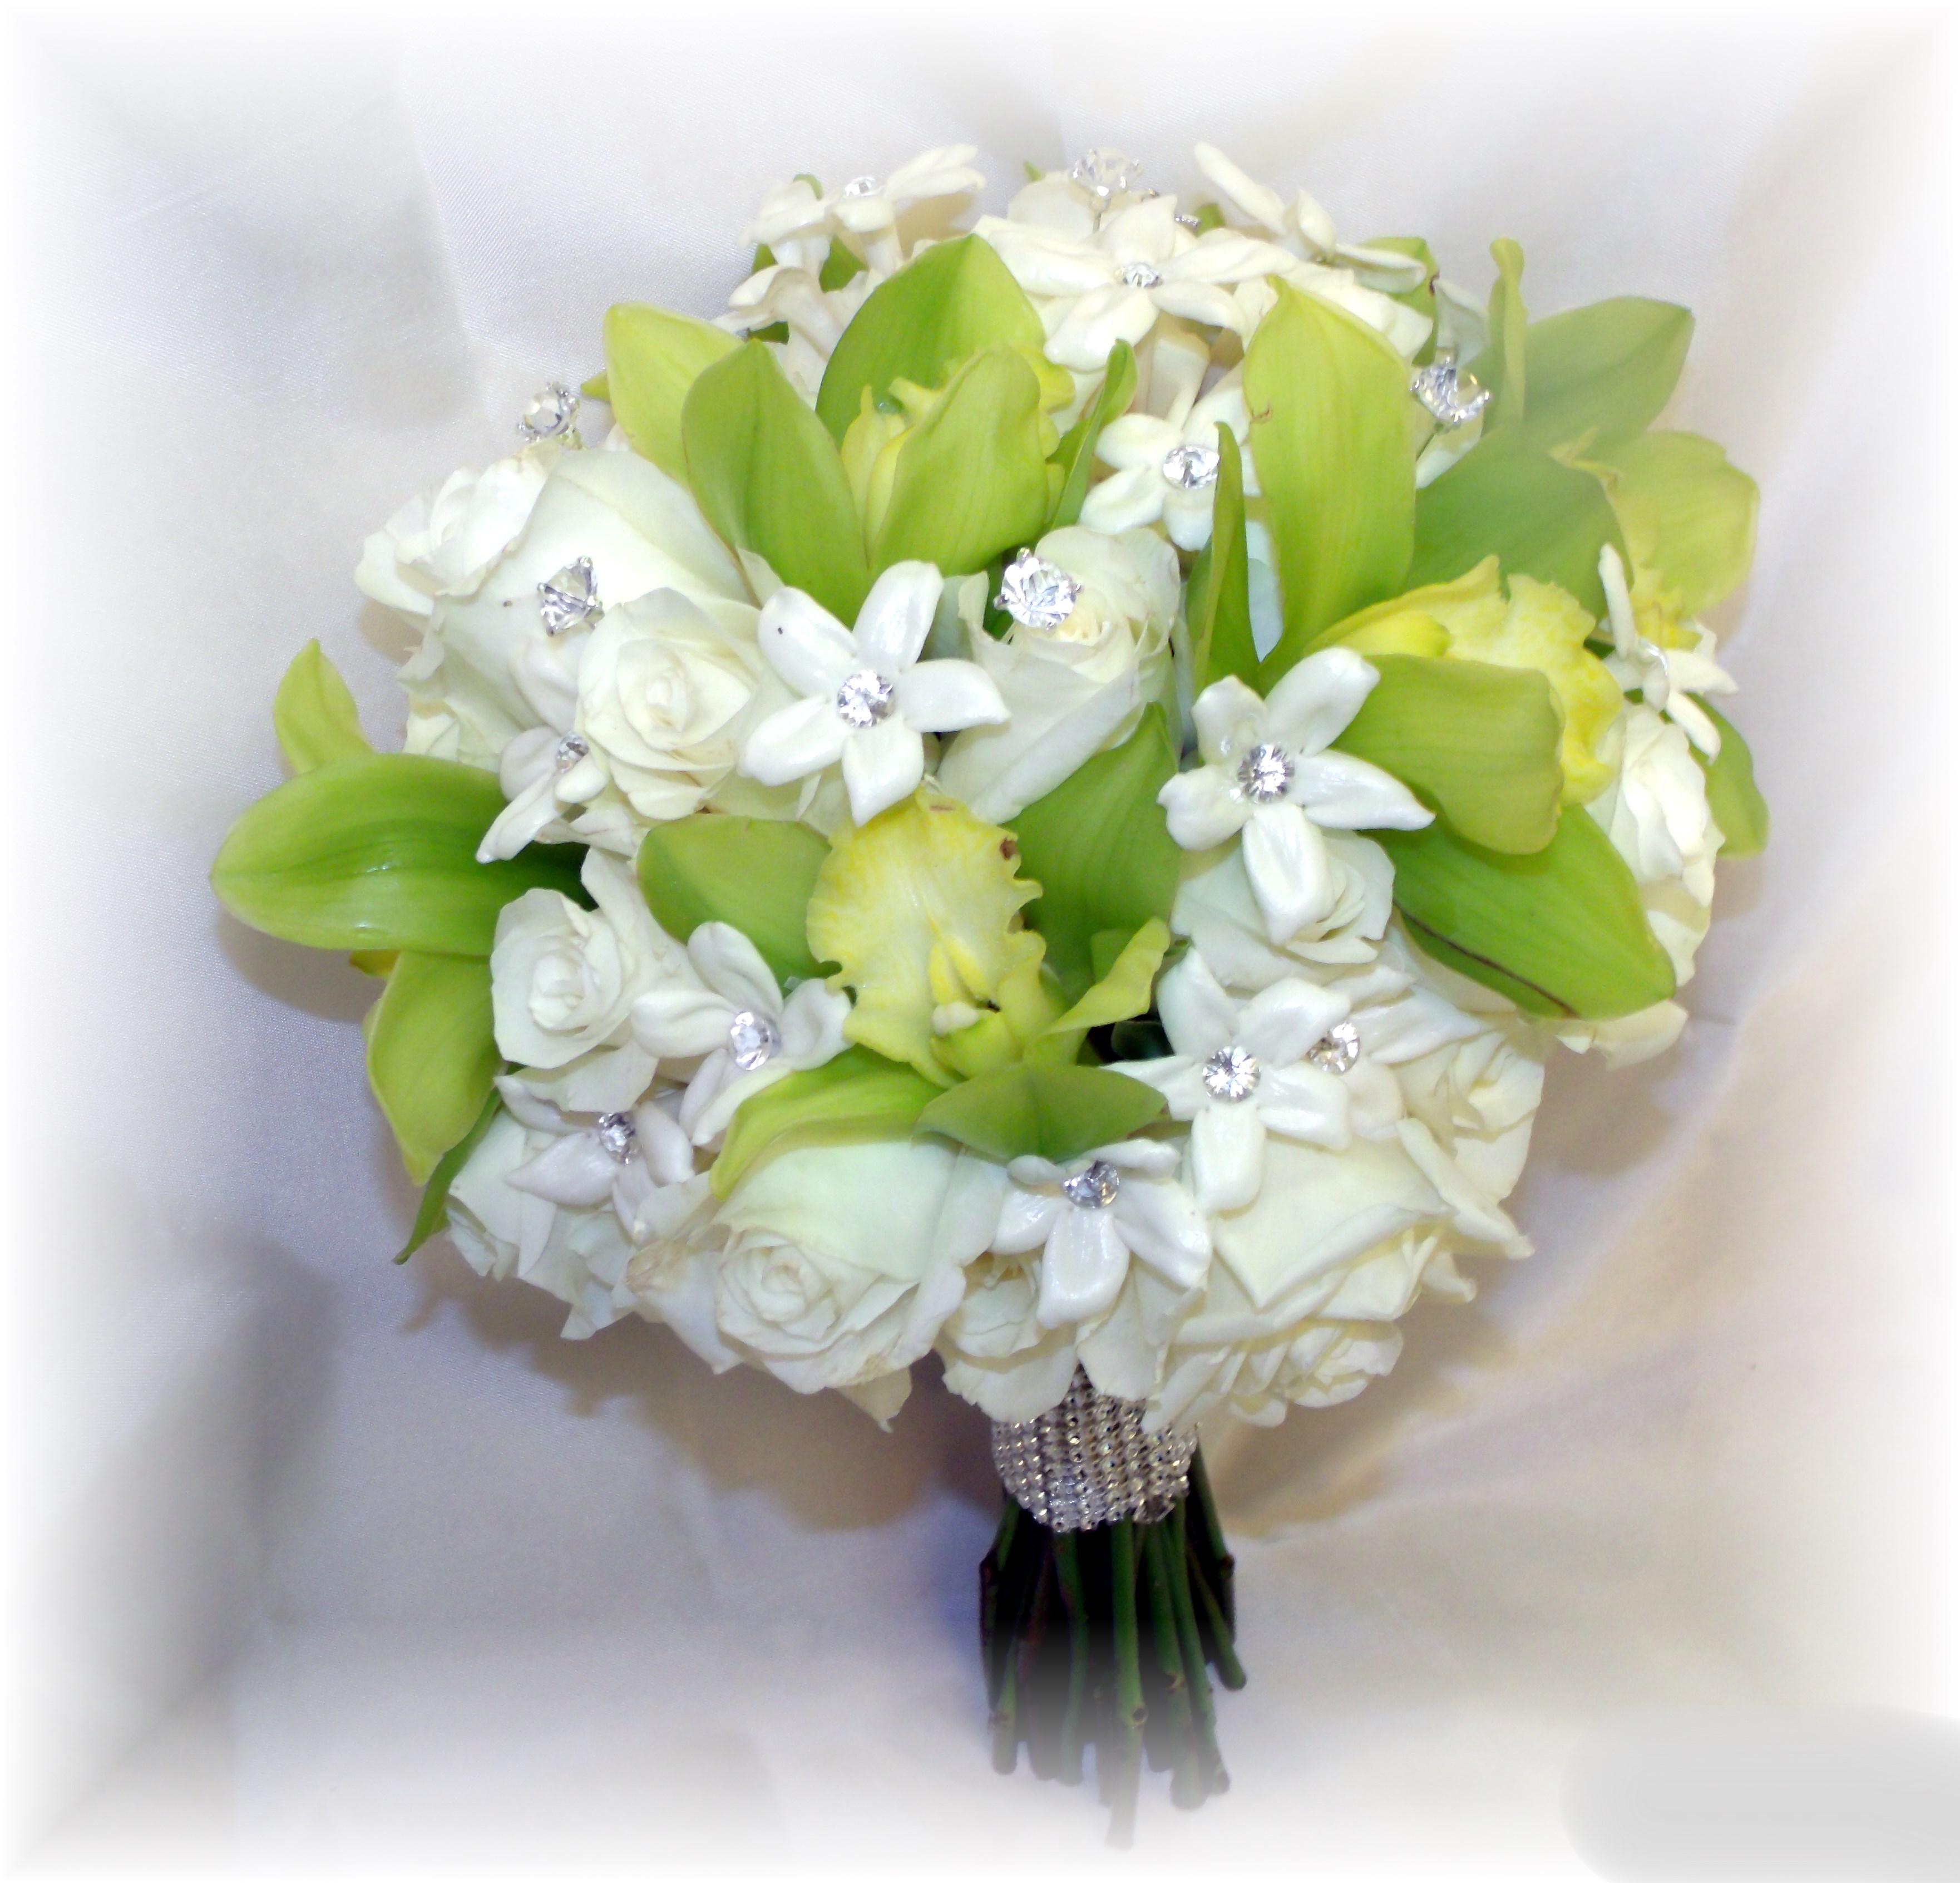 Hydrangea, Roses, Orchids & Stephano